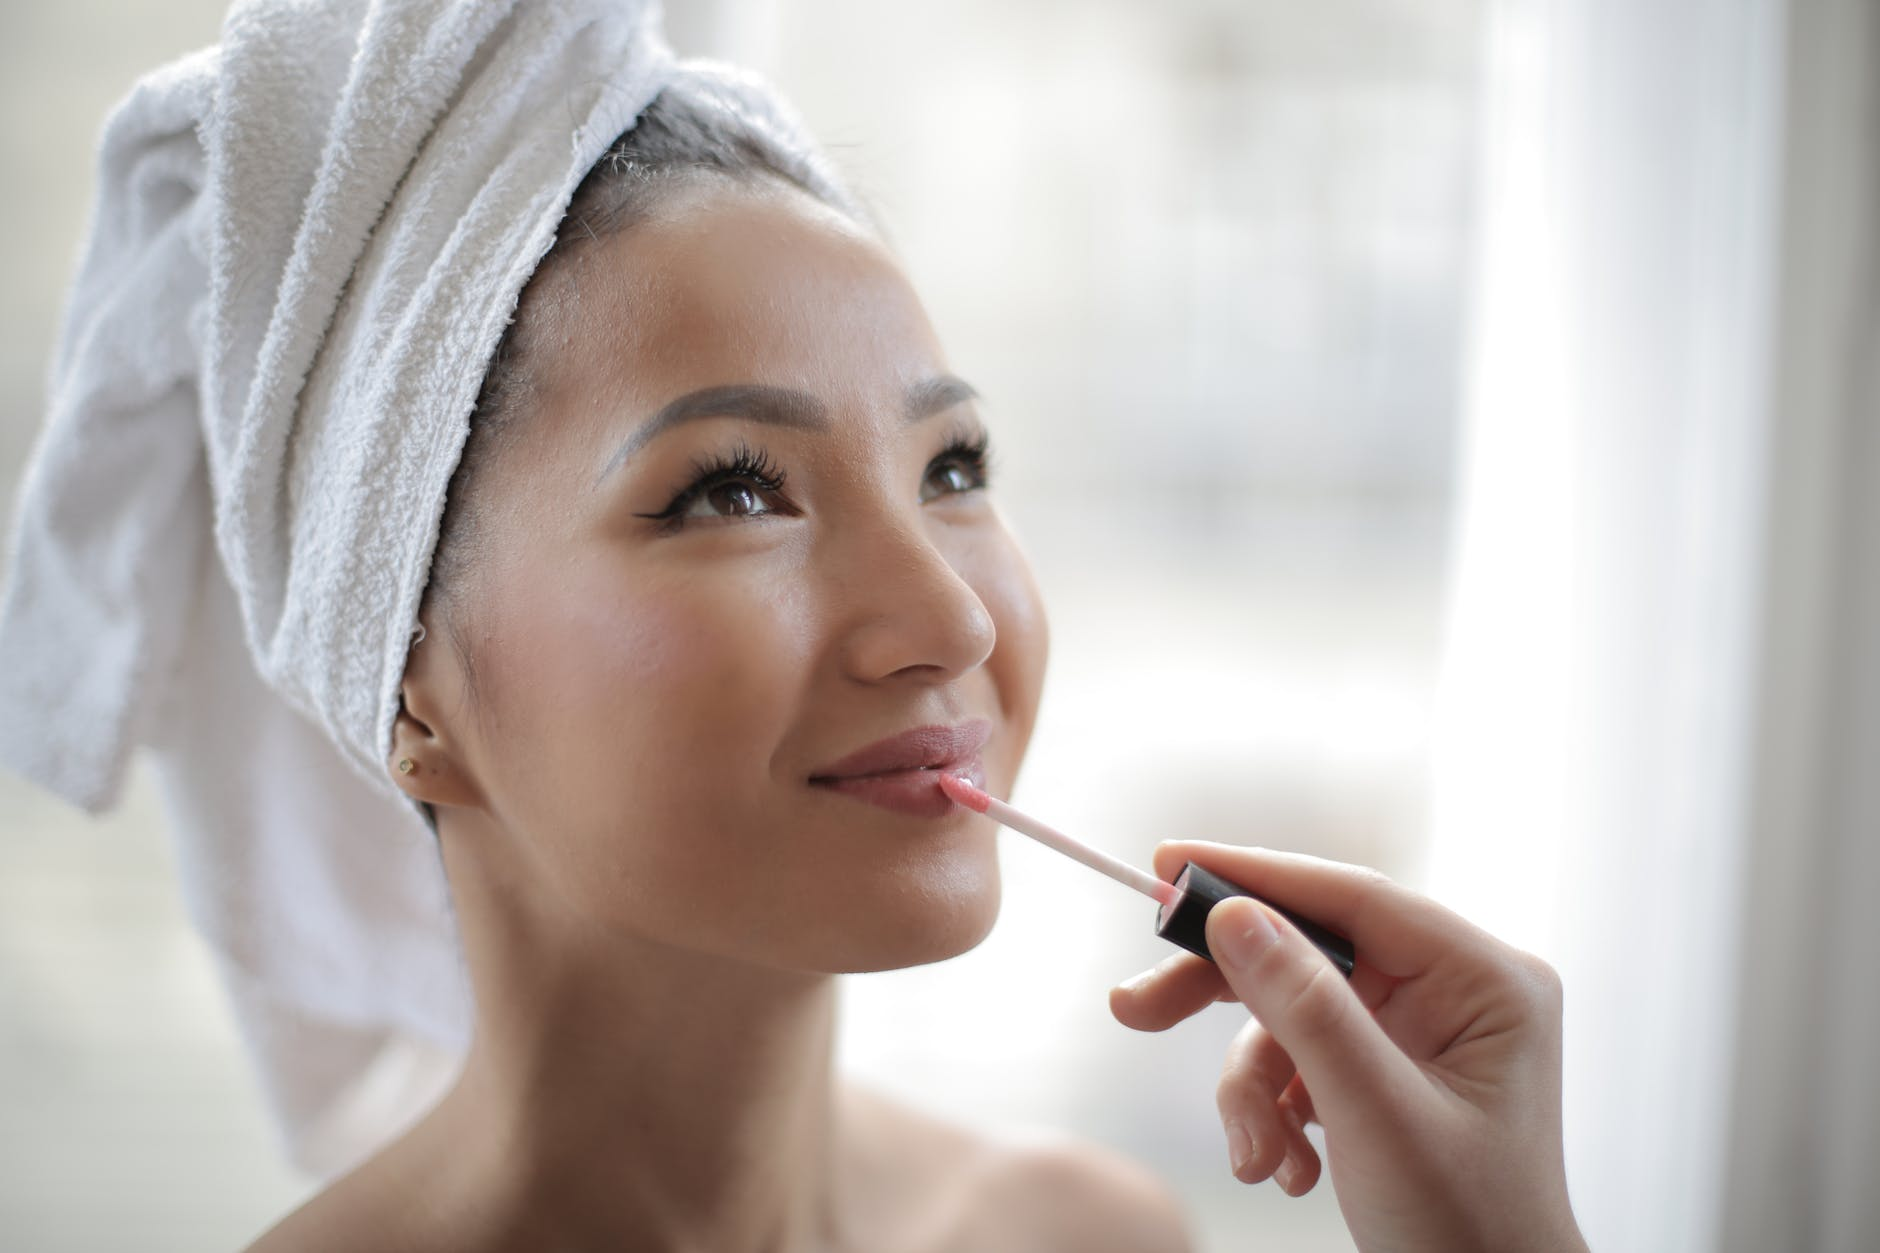 Cum poti sa iti detoxifiezi organismul prin schimbarea rutinei de infrumusetare? – Partea 2